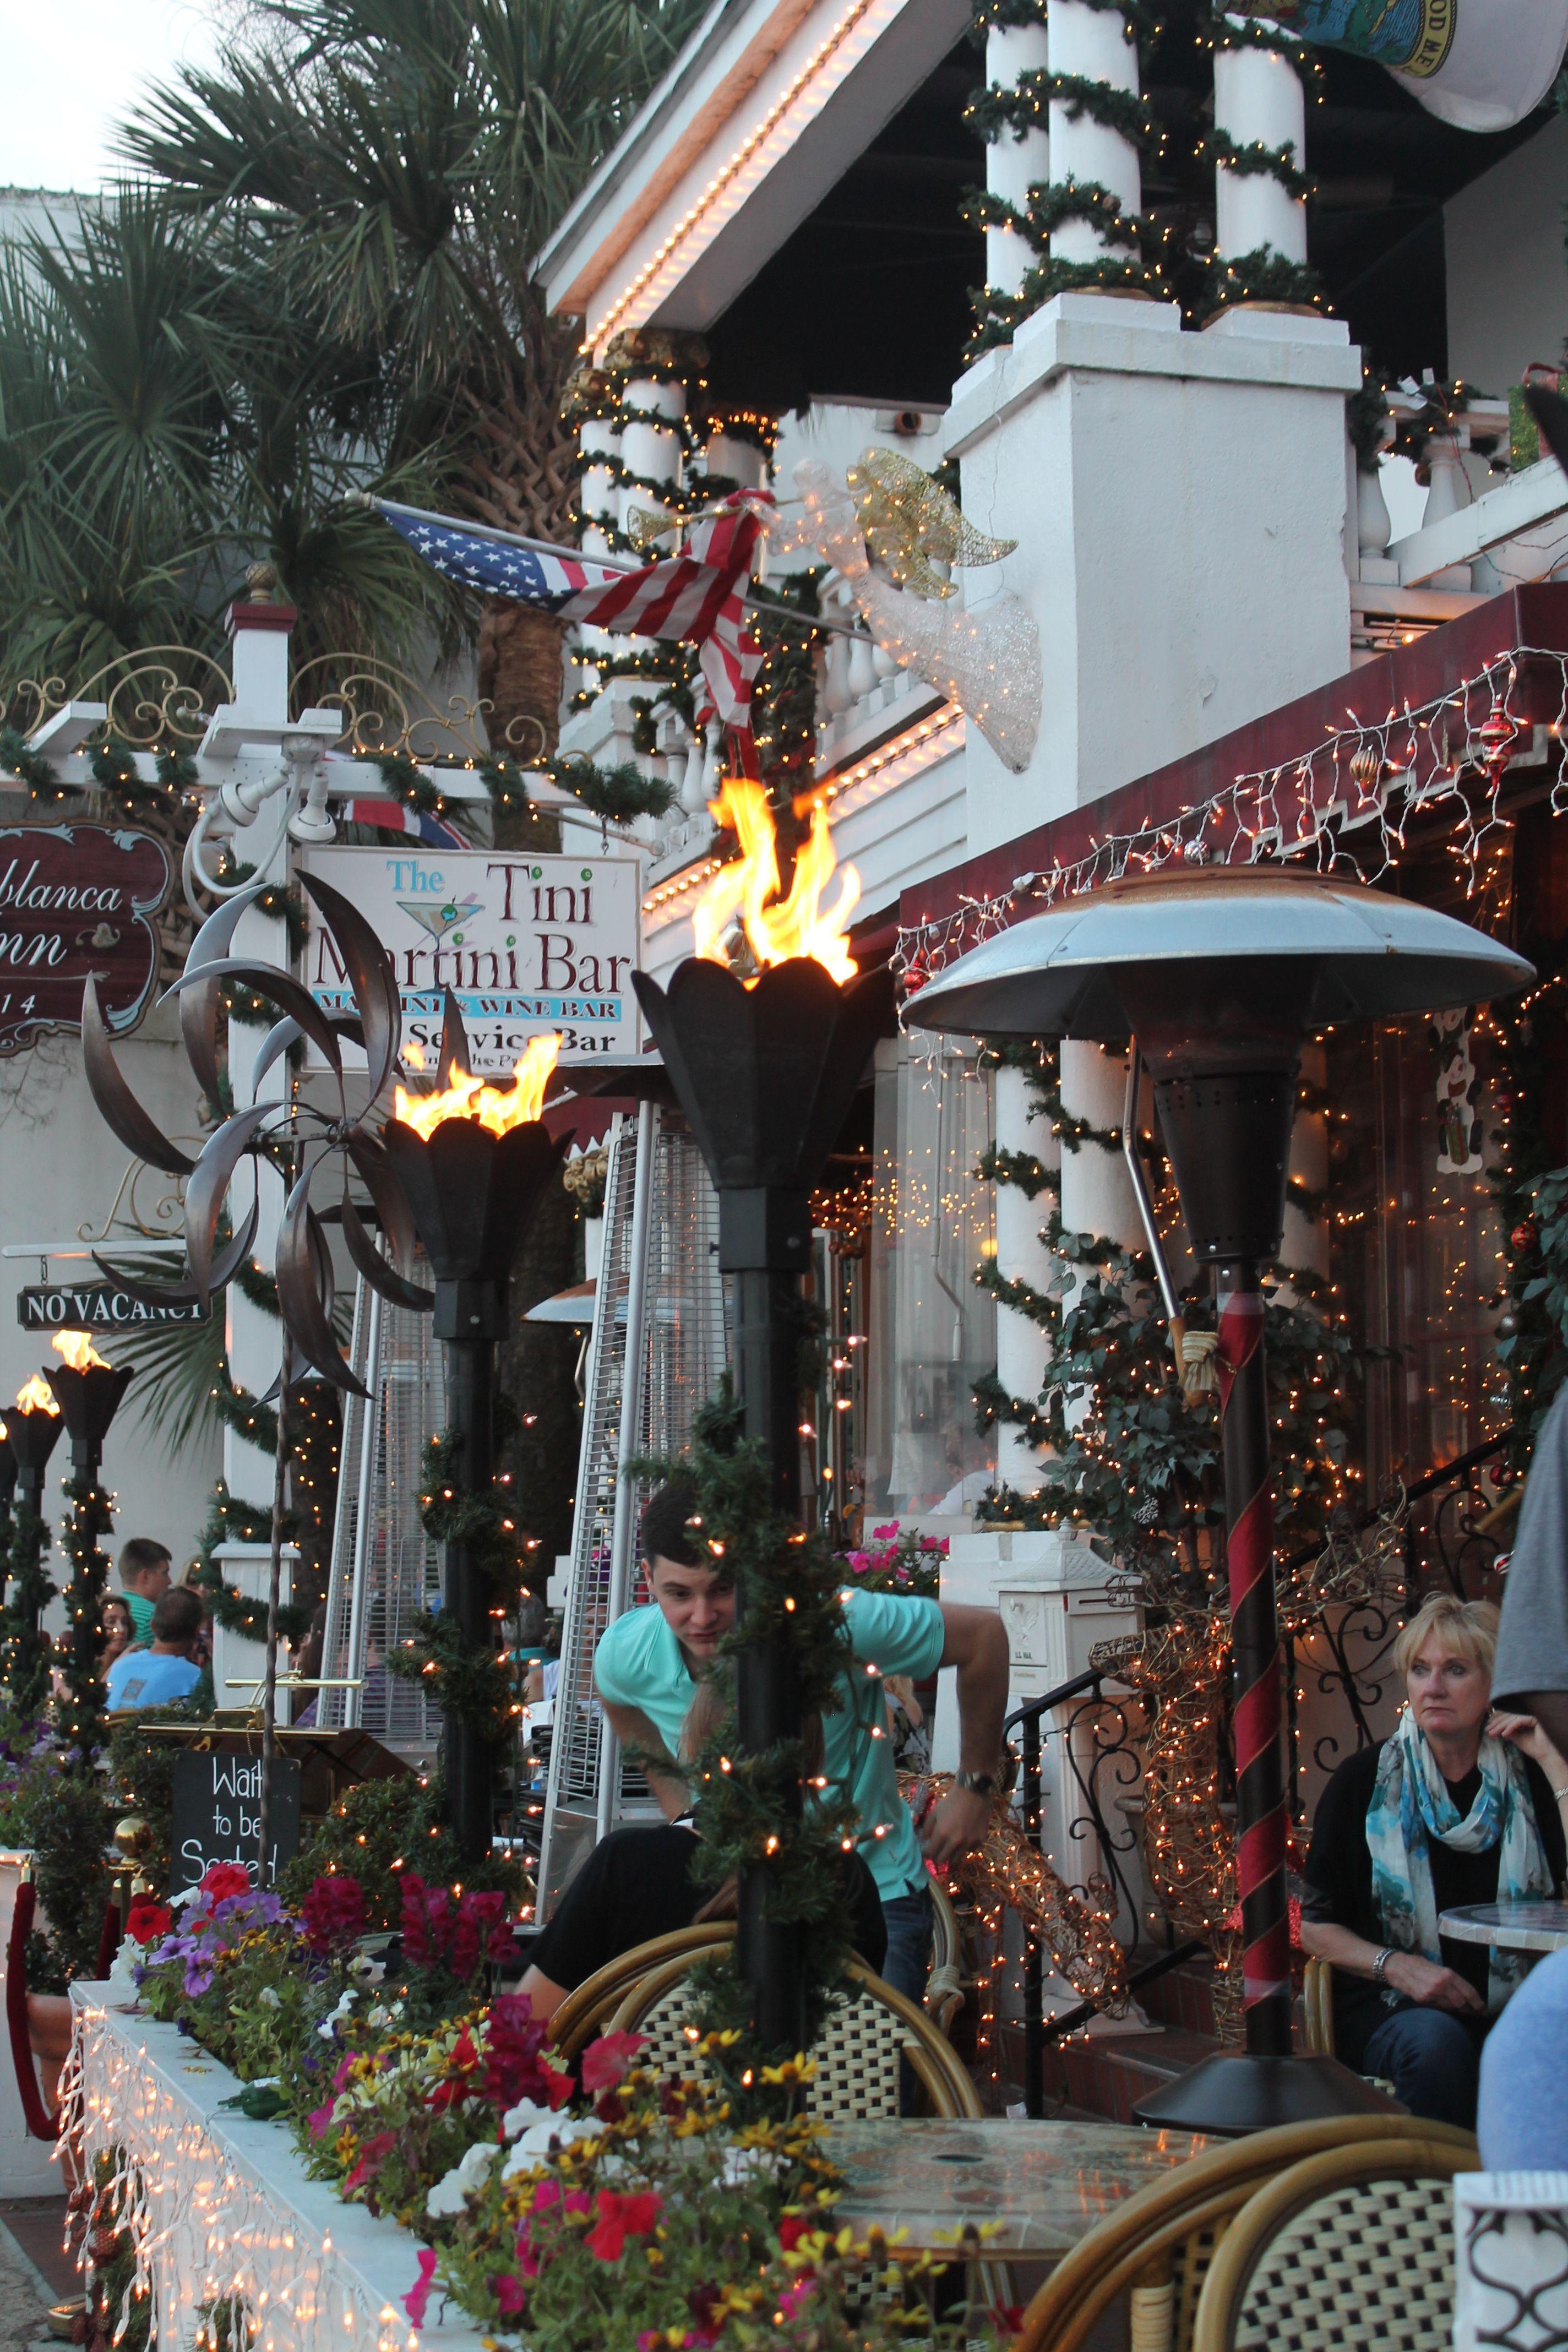 The Tini Martini Bar St Augustine Florida Dec 28 2014 Travel Luna De Miel Vacaciones